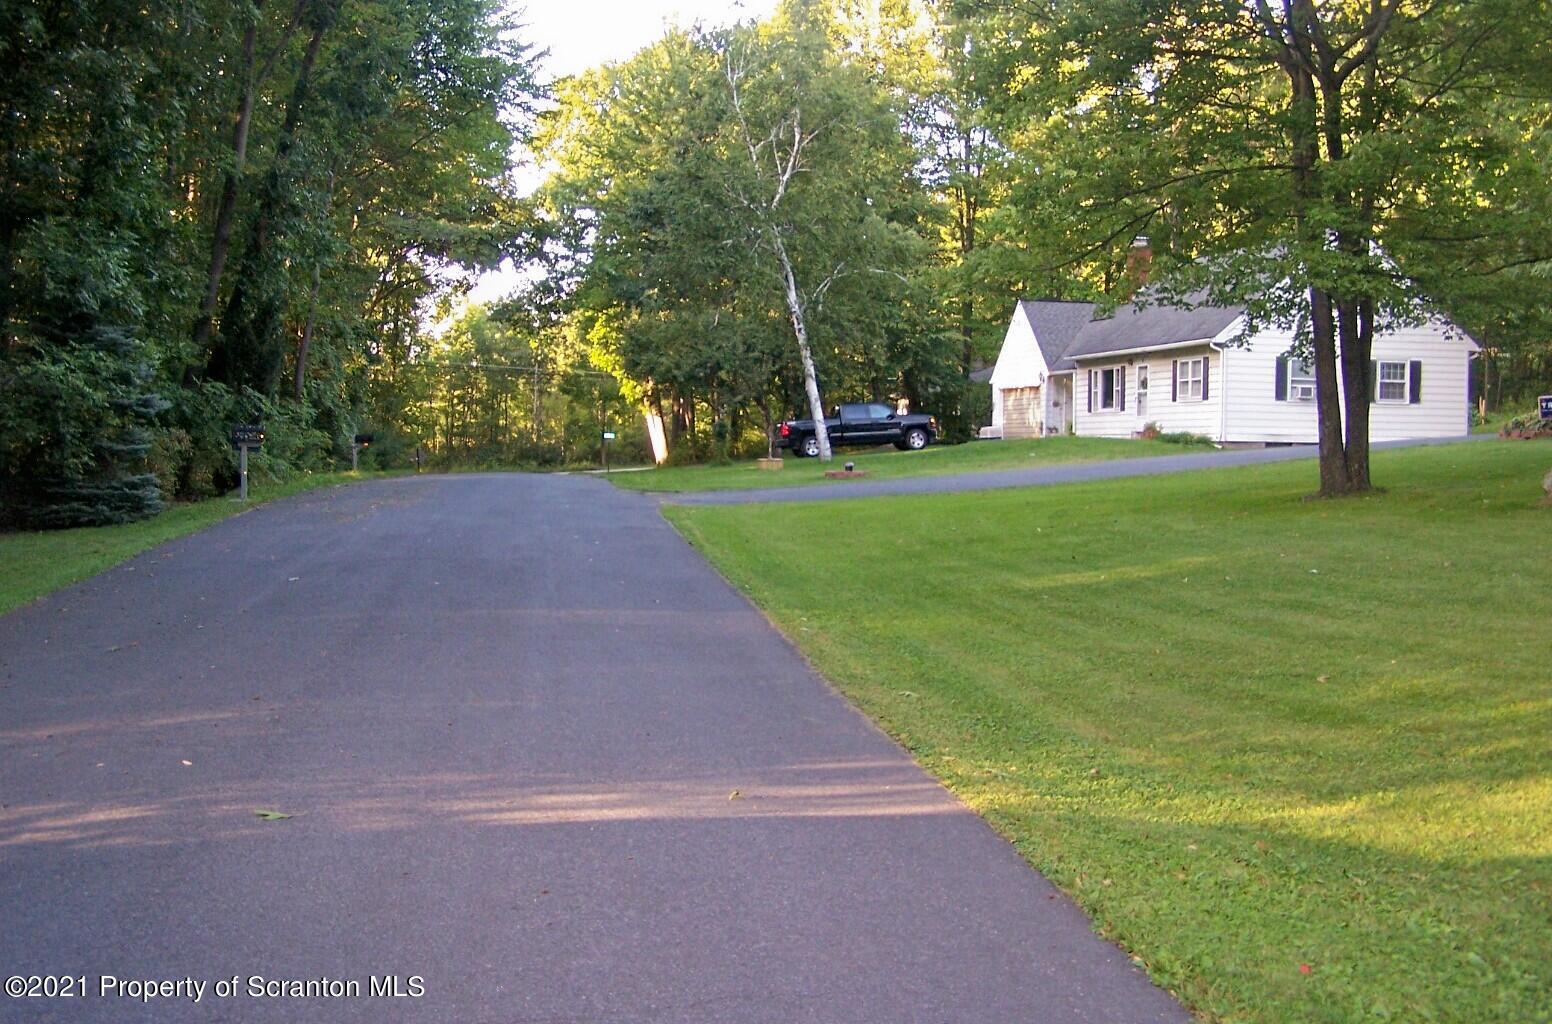 11 Laurel Dr, Tunkhannock, Pennsylvania 18657, 3 Bedrooms Bedrooms, 6 Rooms Rooms,2 BathroomsBathrooms,Single Family,For Sale,Laurel,21-1183